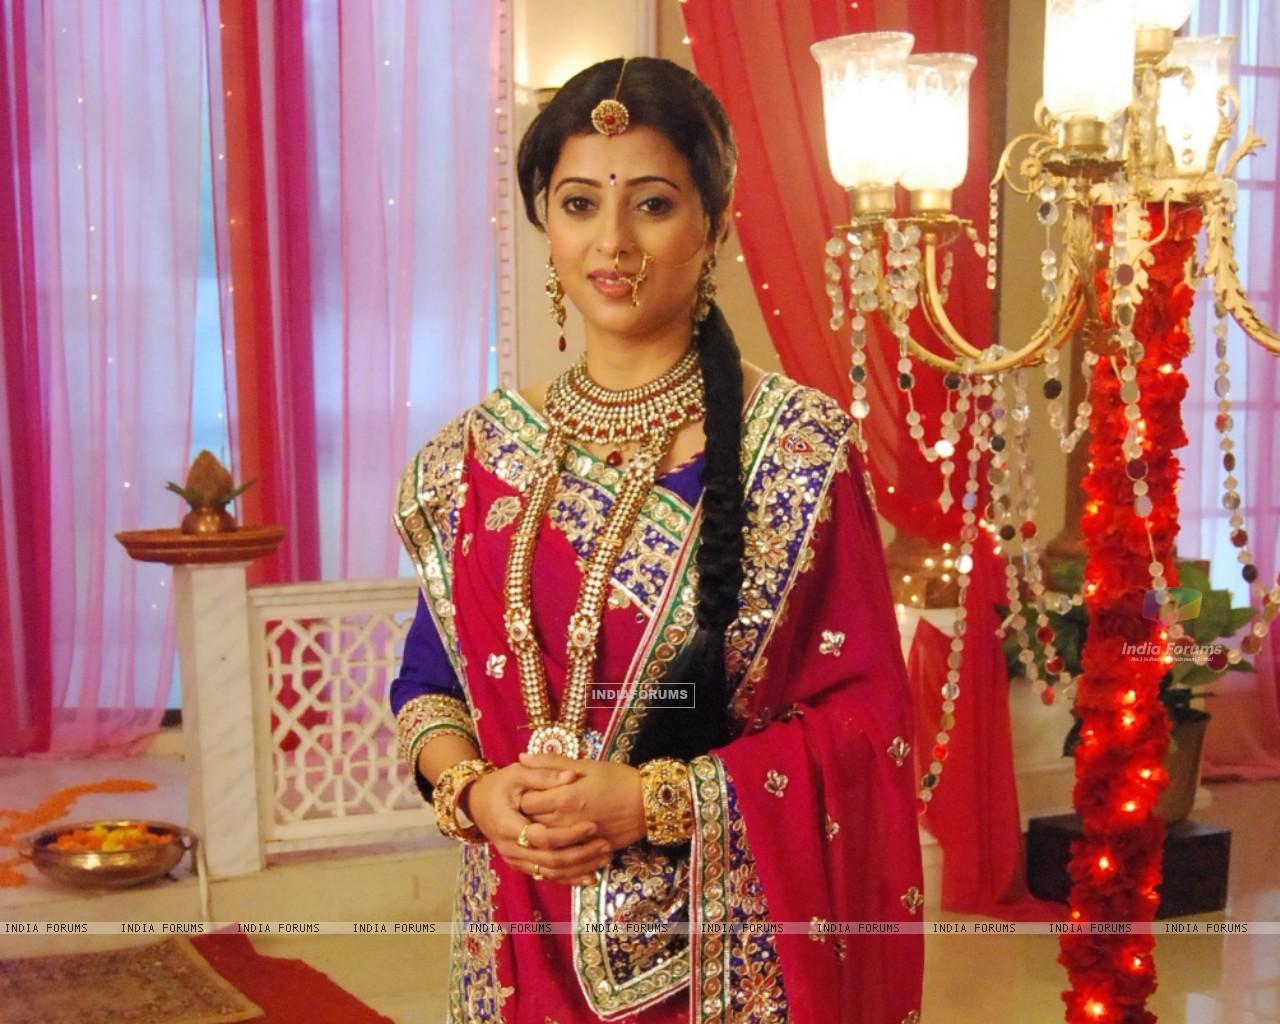 Aur Pyaar Ho Gaya Size - Reena Kapoor , HD Wallpaper & Backgrounds